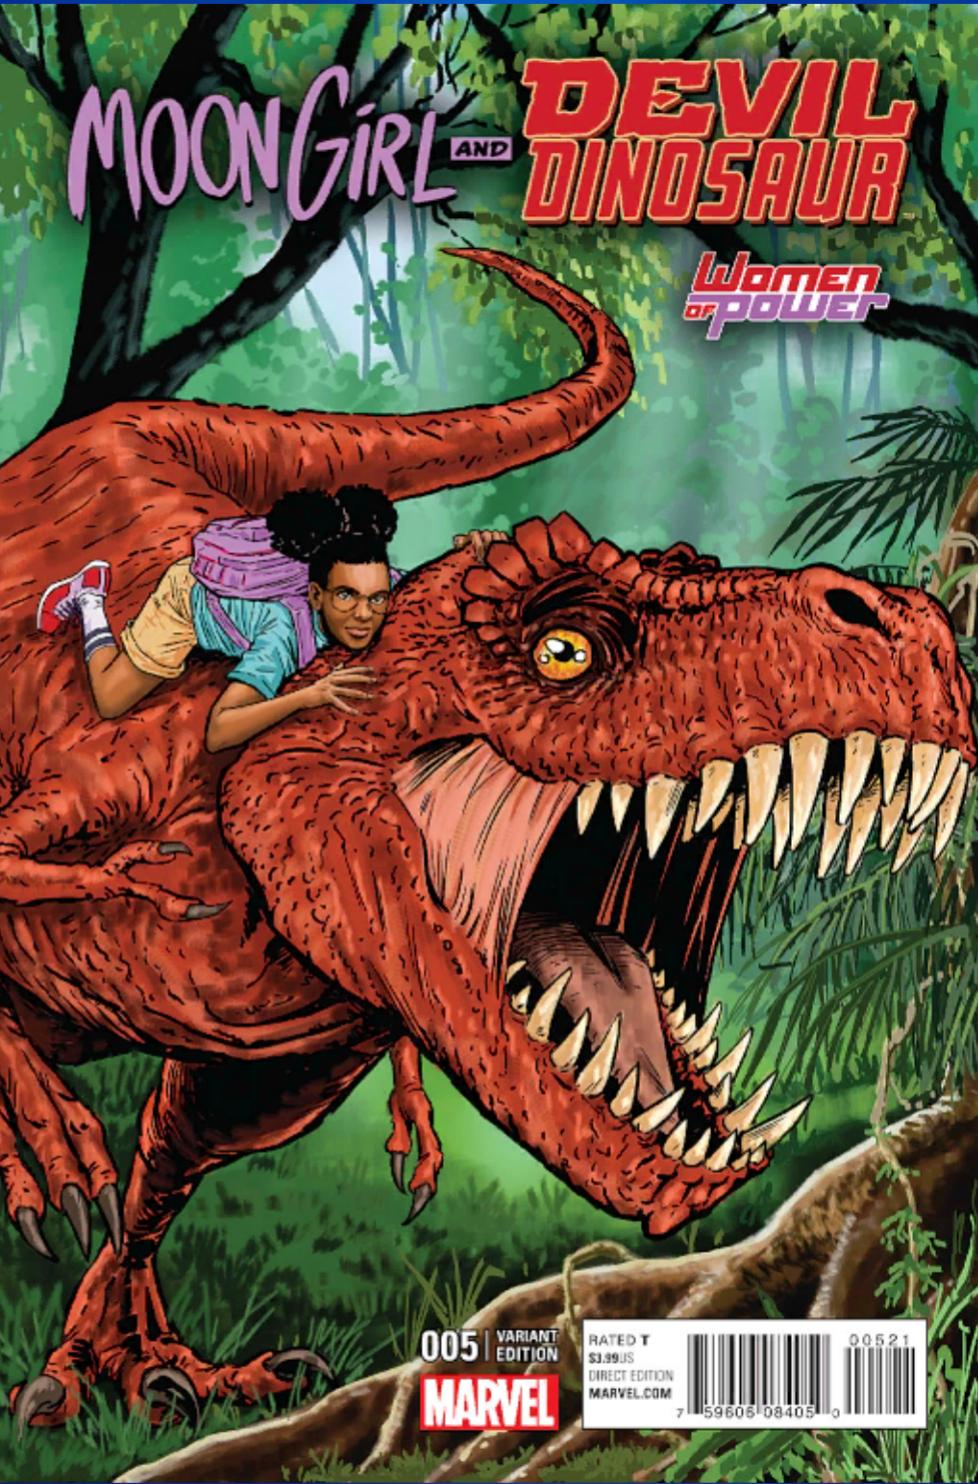 The Hunt: Savage (4) Missions